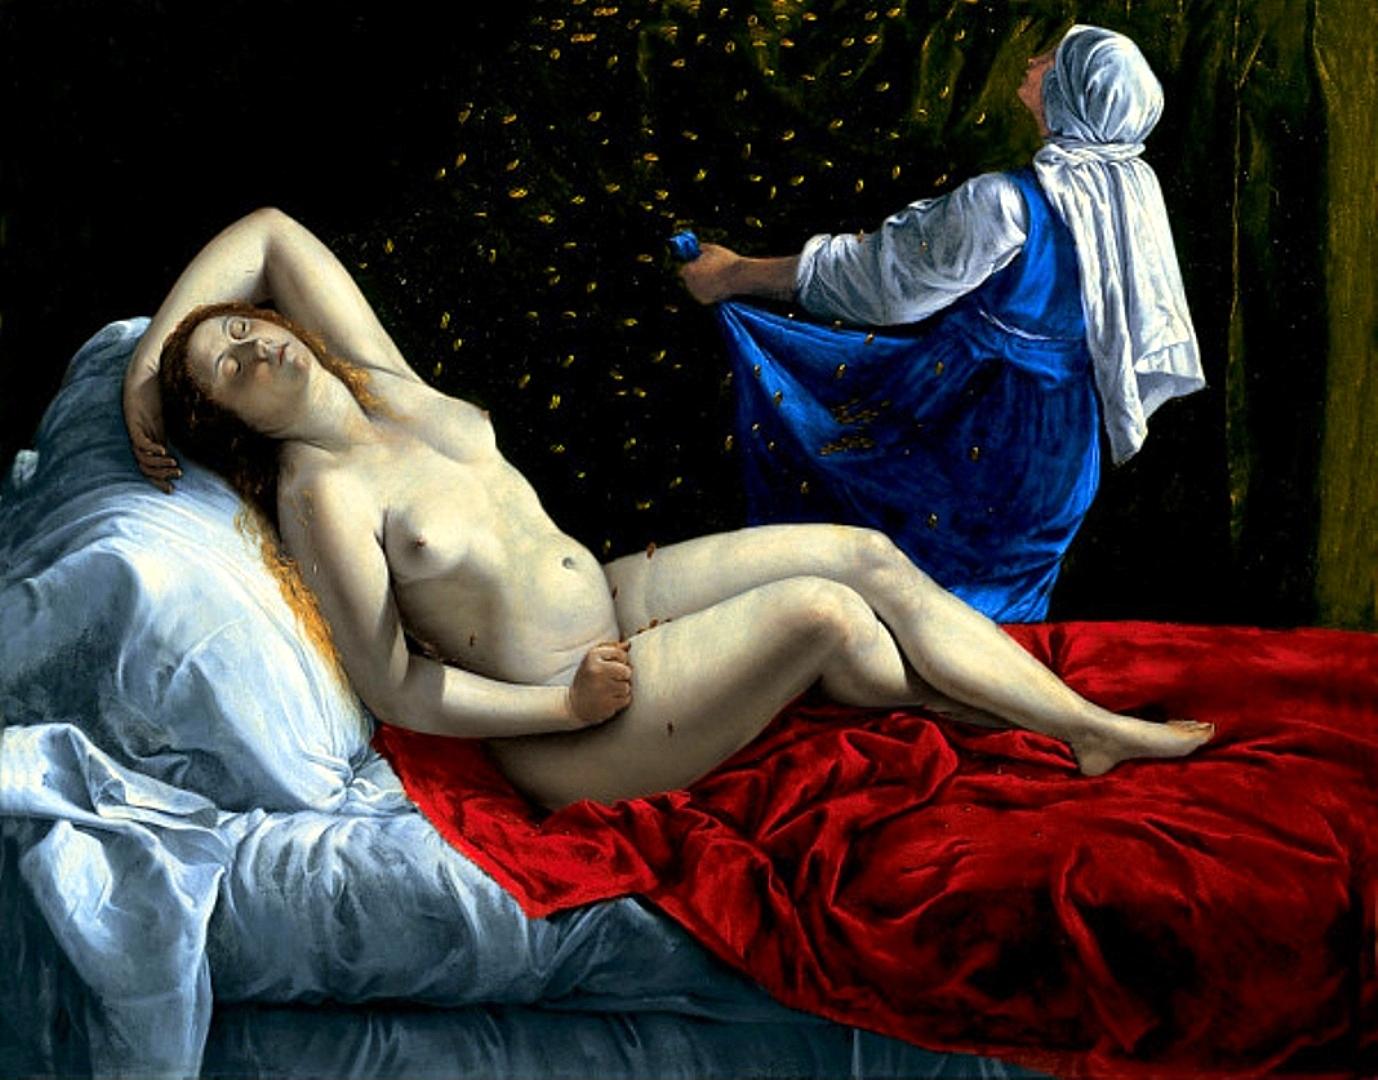 Good phrase Erotic illusions beheaded consider, that